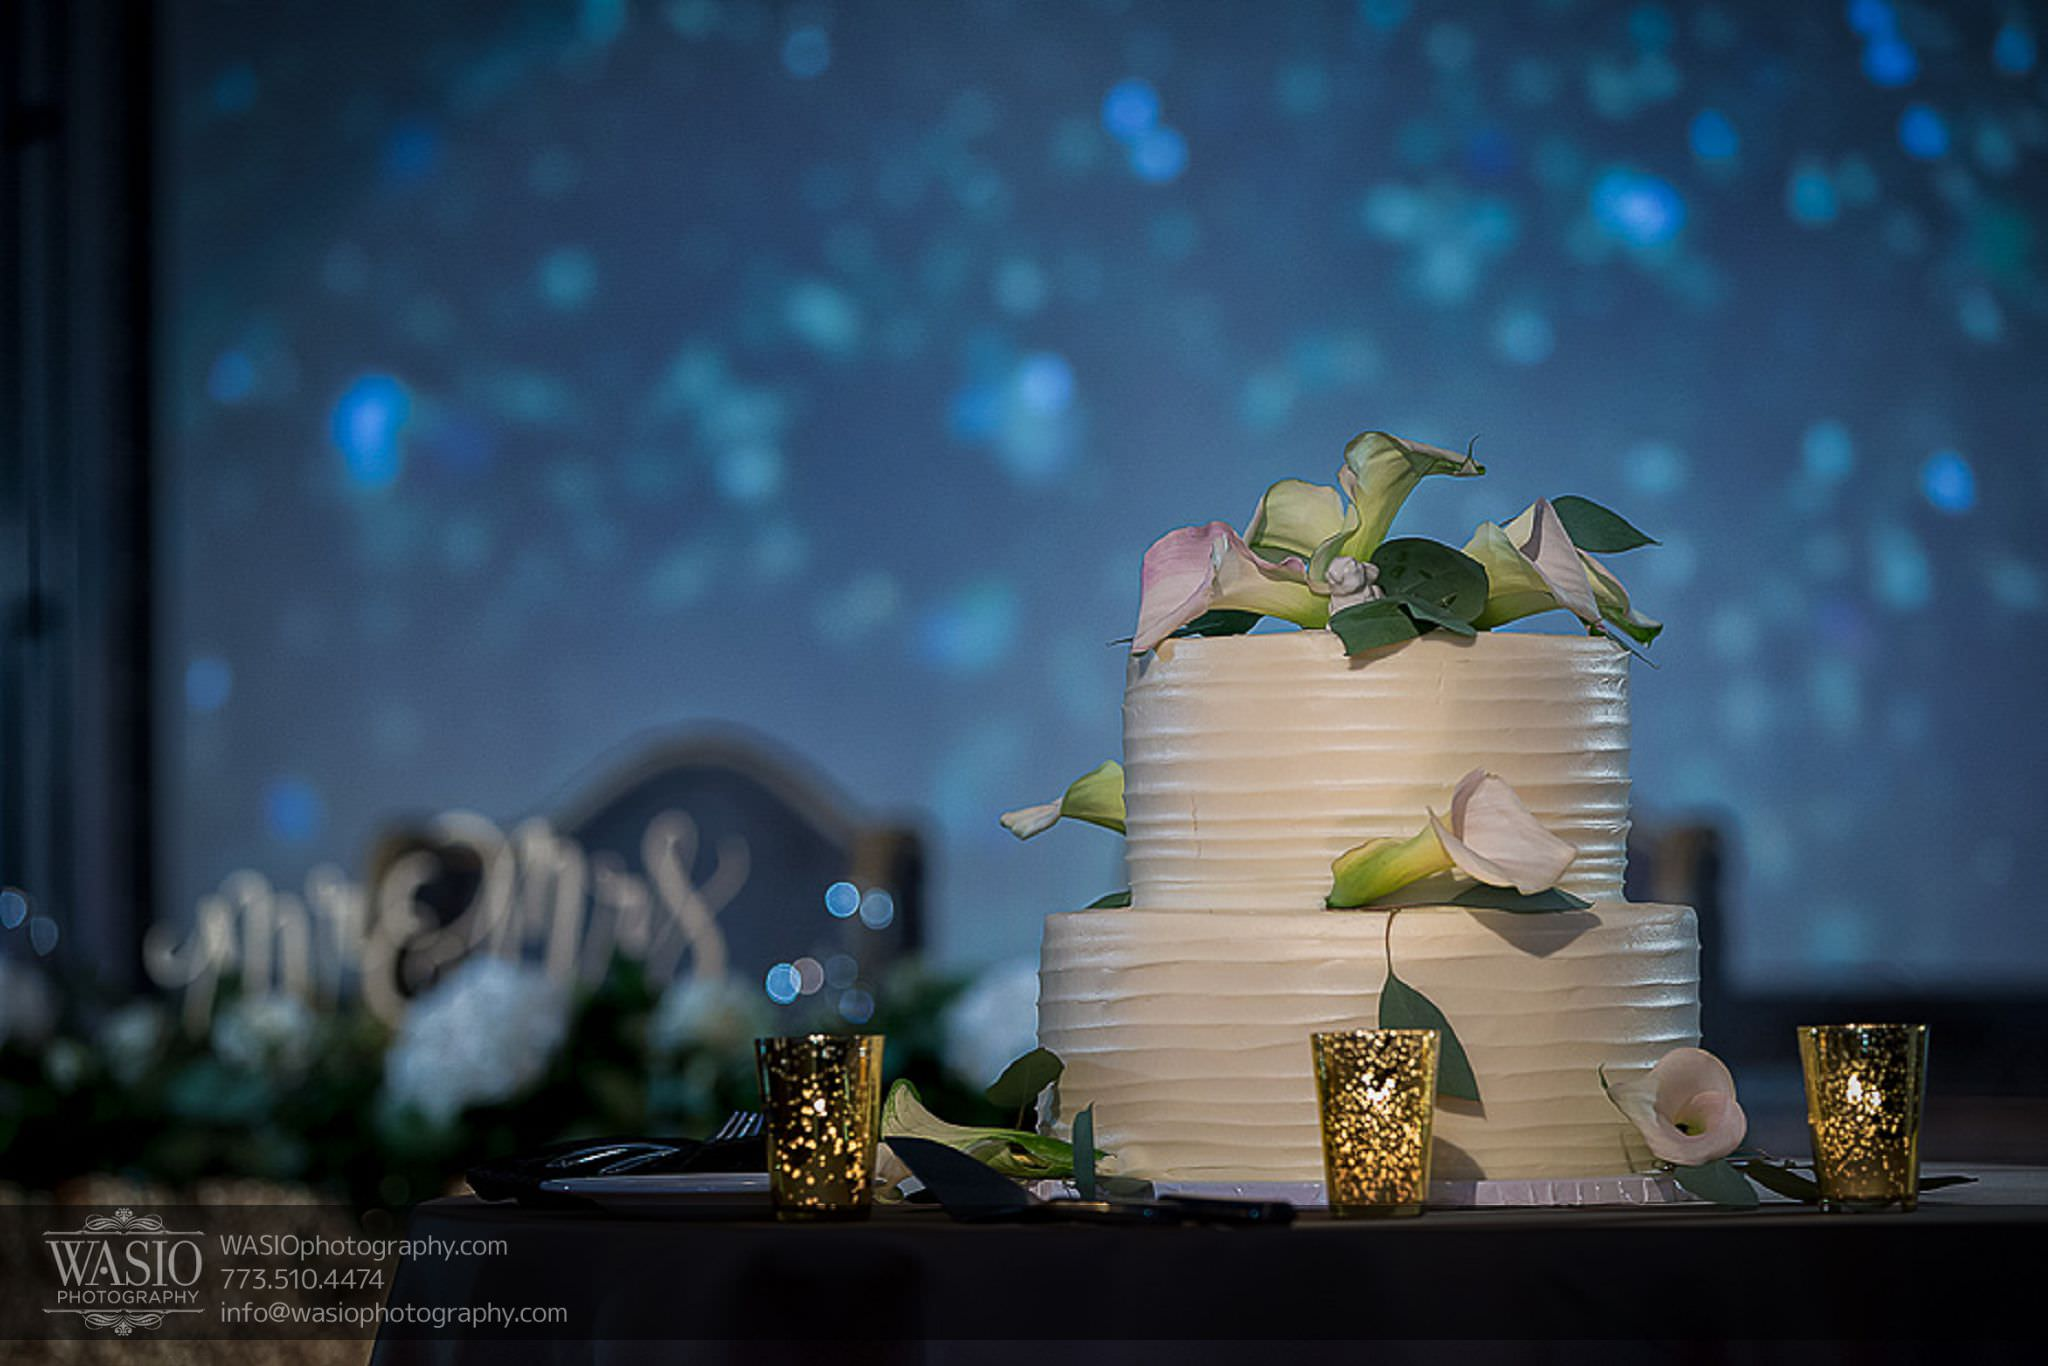 venue-one-chicago-wedding-sweet-mandy-bs-wedding-cake-bunnies-67 Venue One Chicago Wedding - Katie + Mike